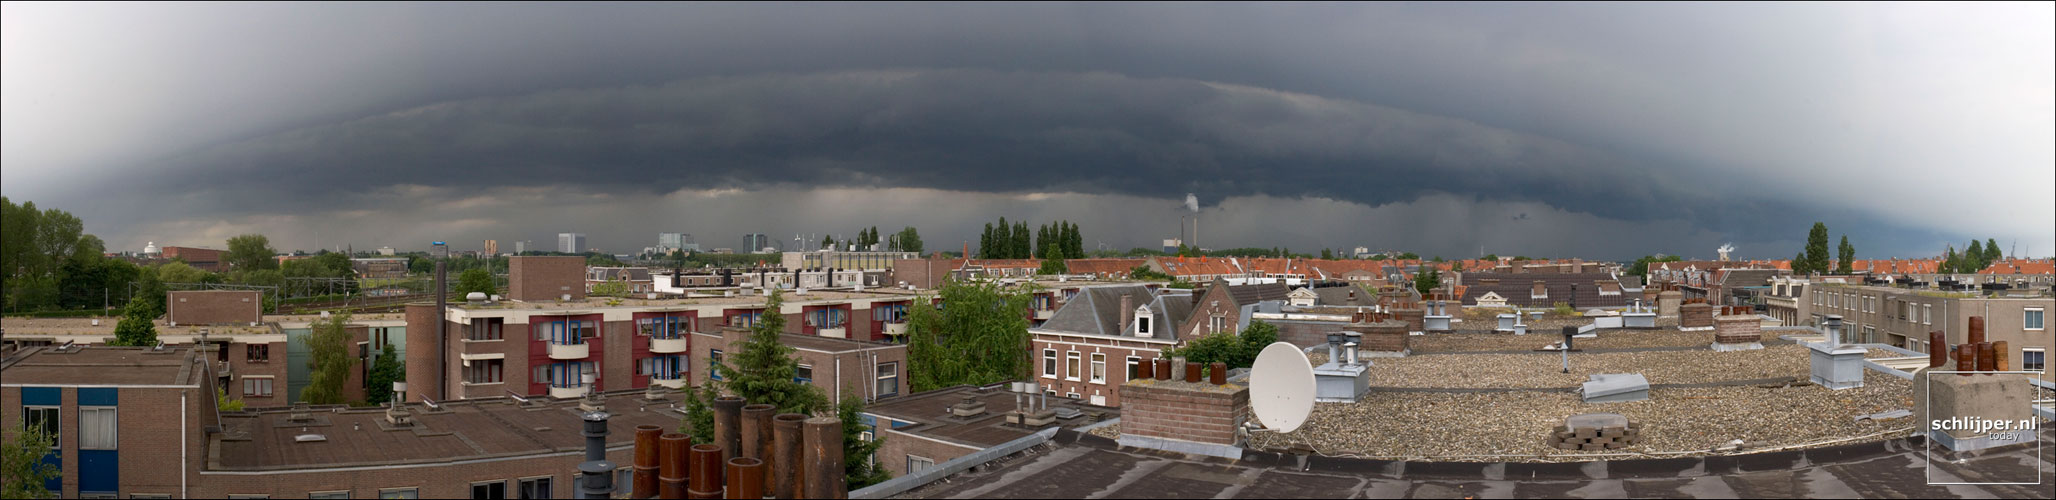 Nederland, Amsterdam, 3 juni 2005